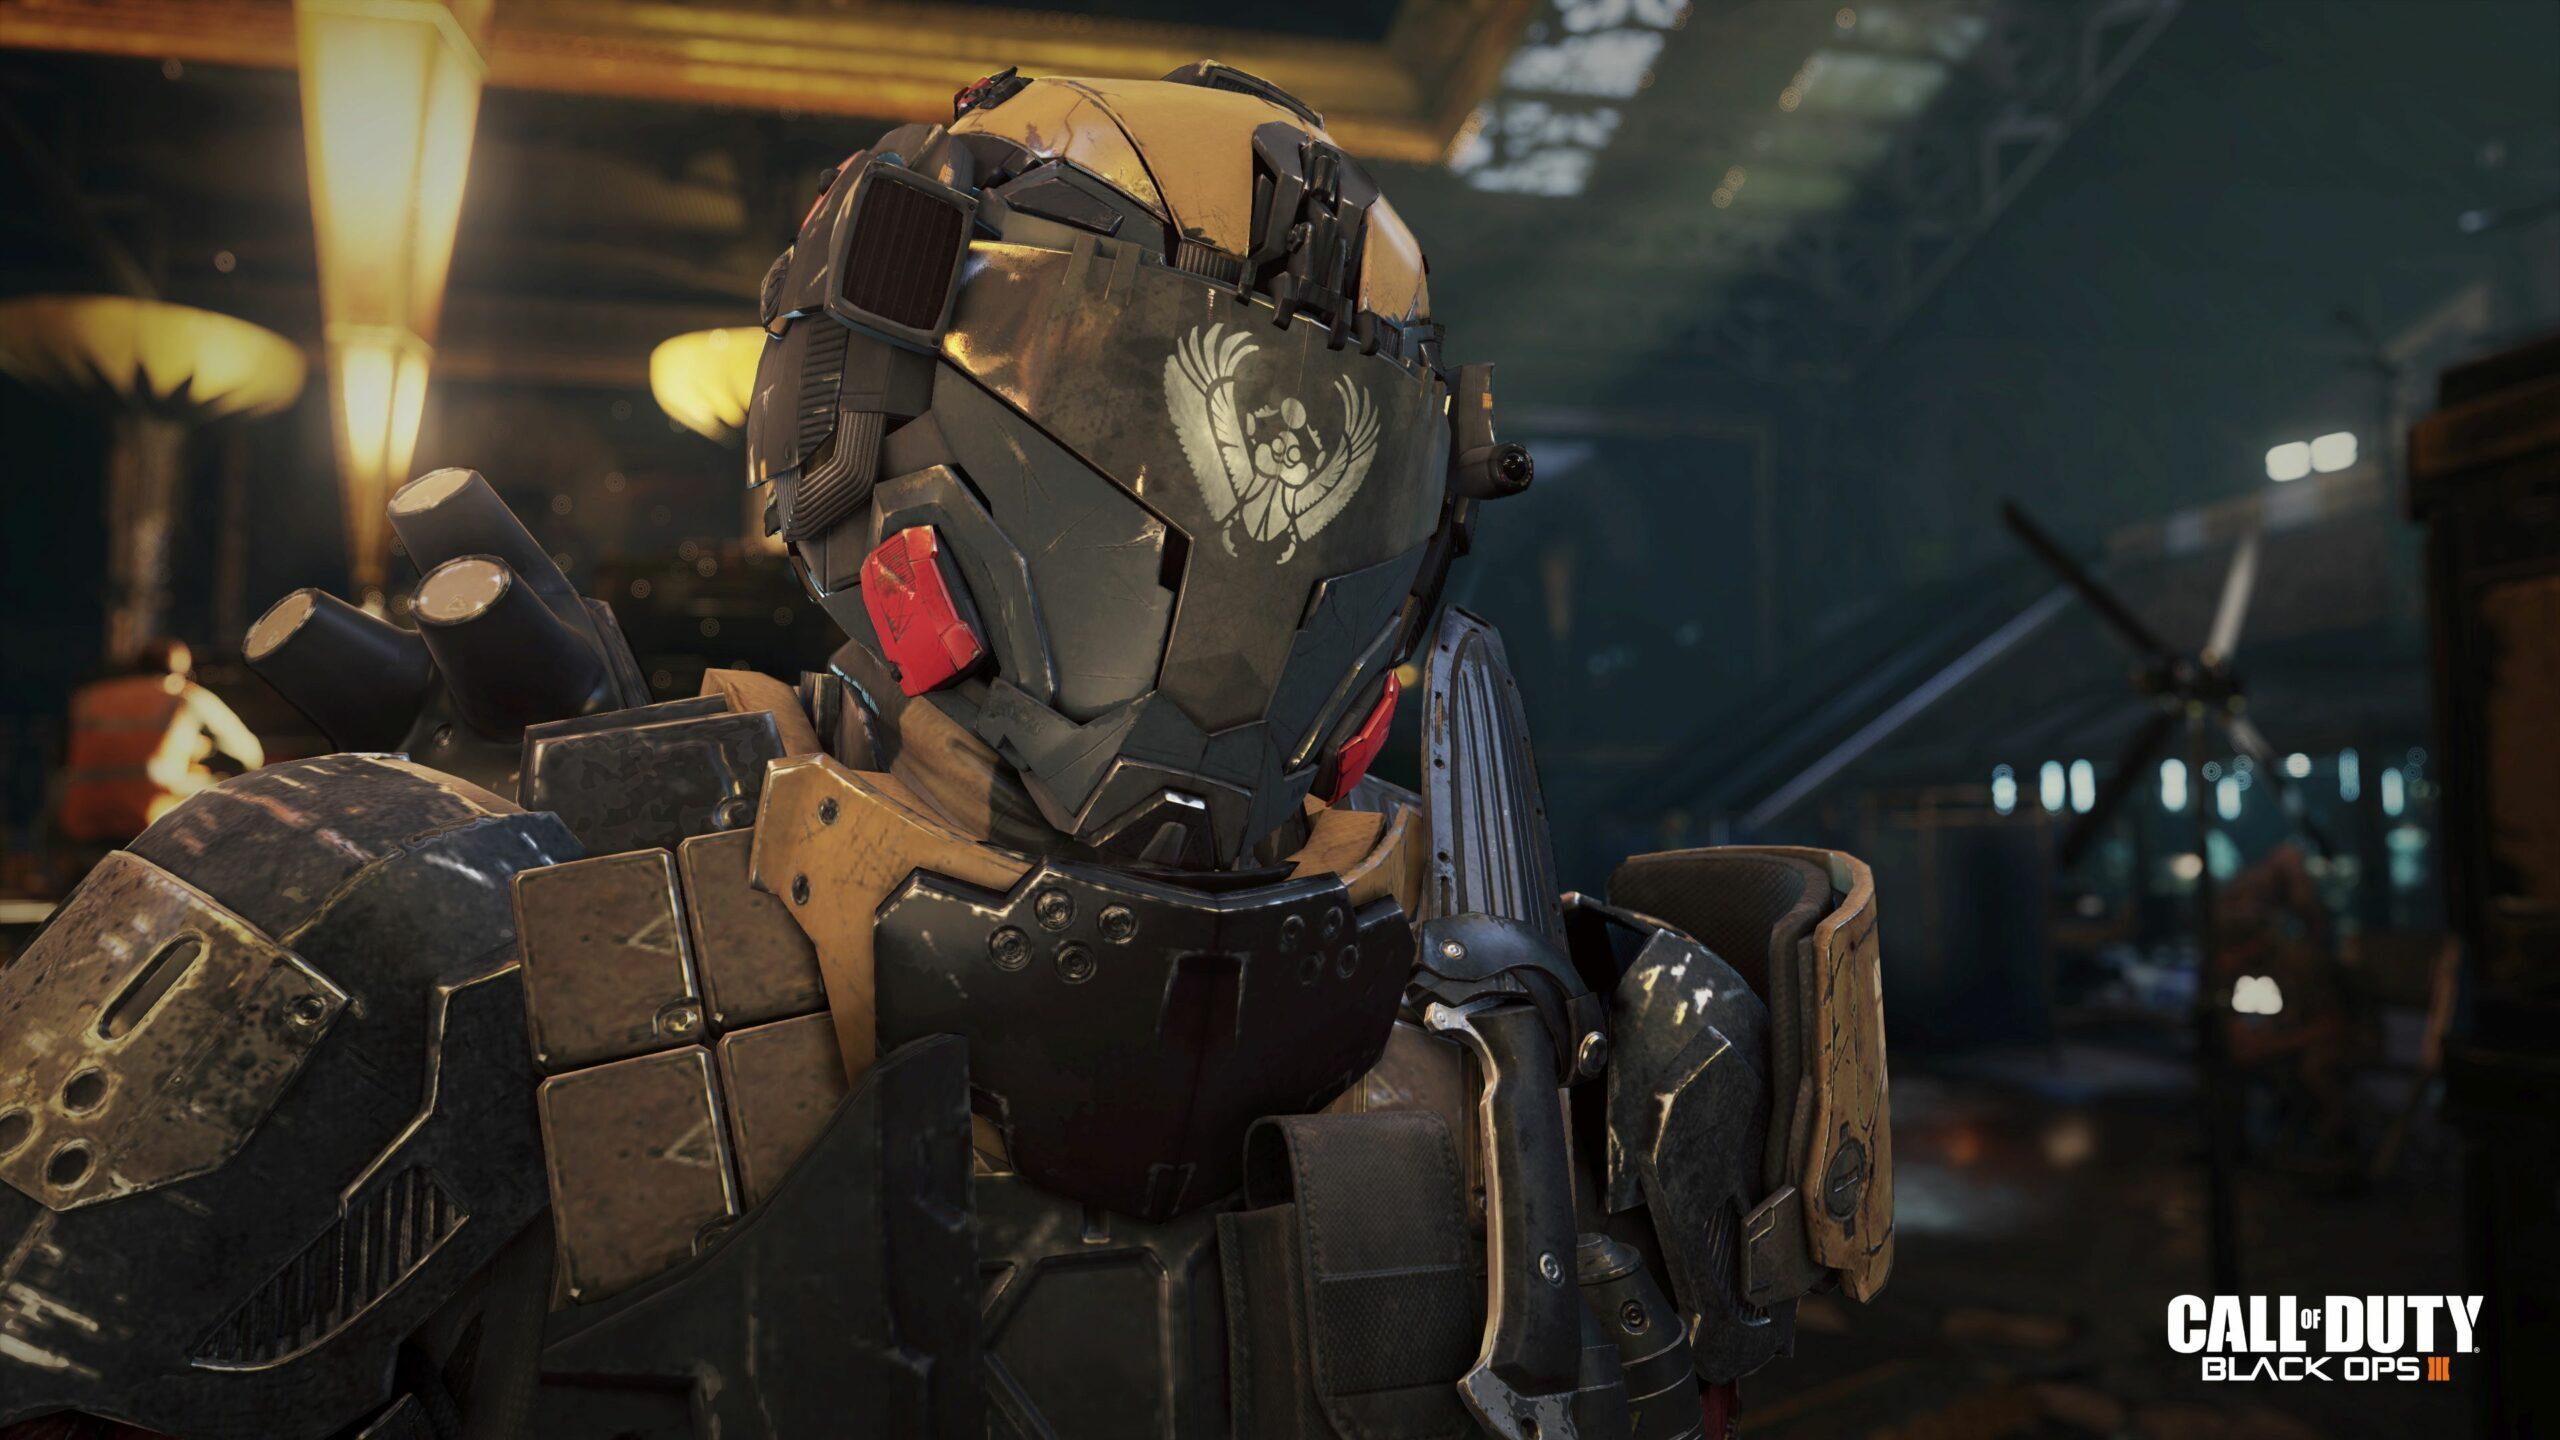 Call-of-Duty-Black-Ops-III_2015_04-26-15_002